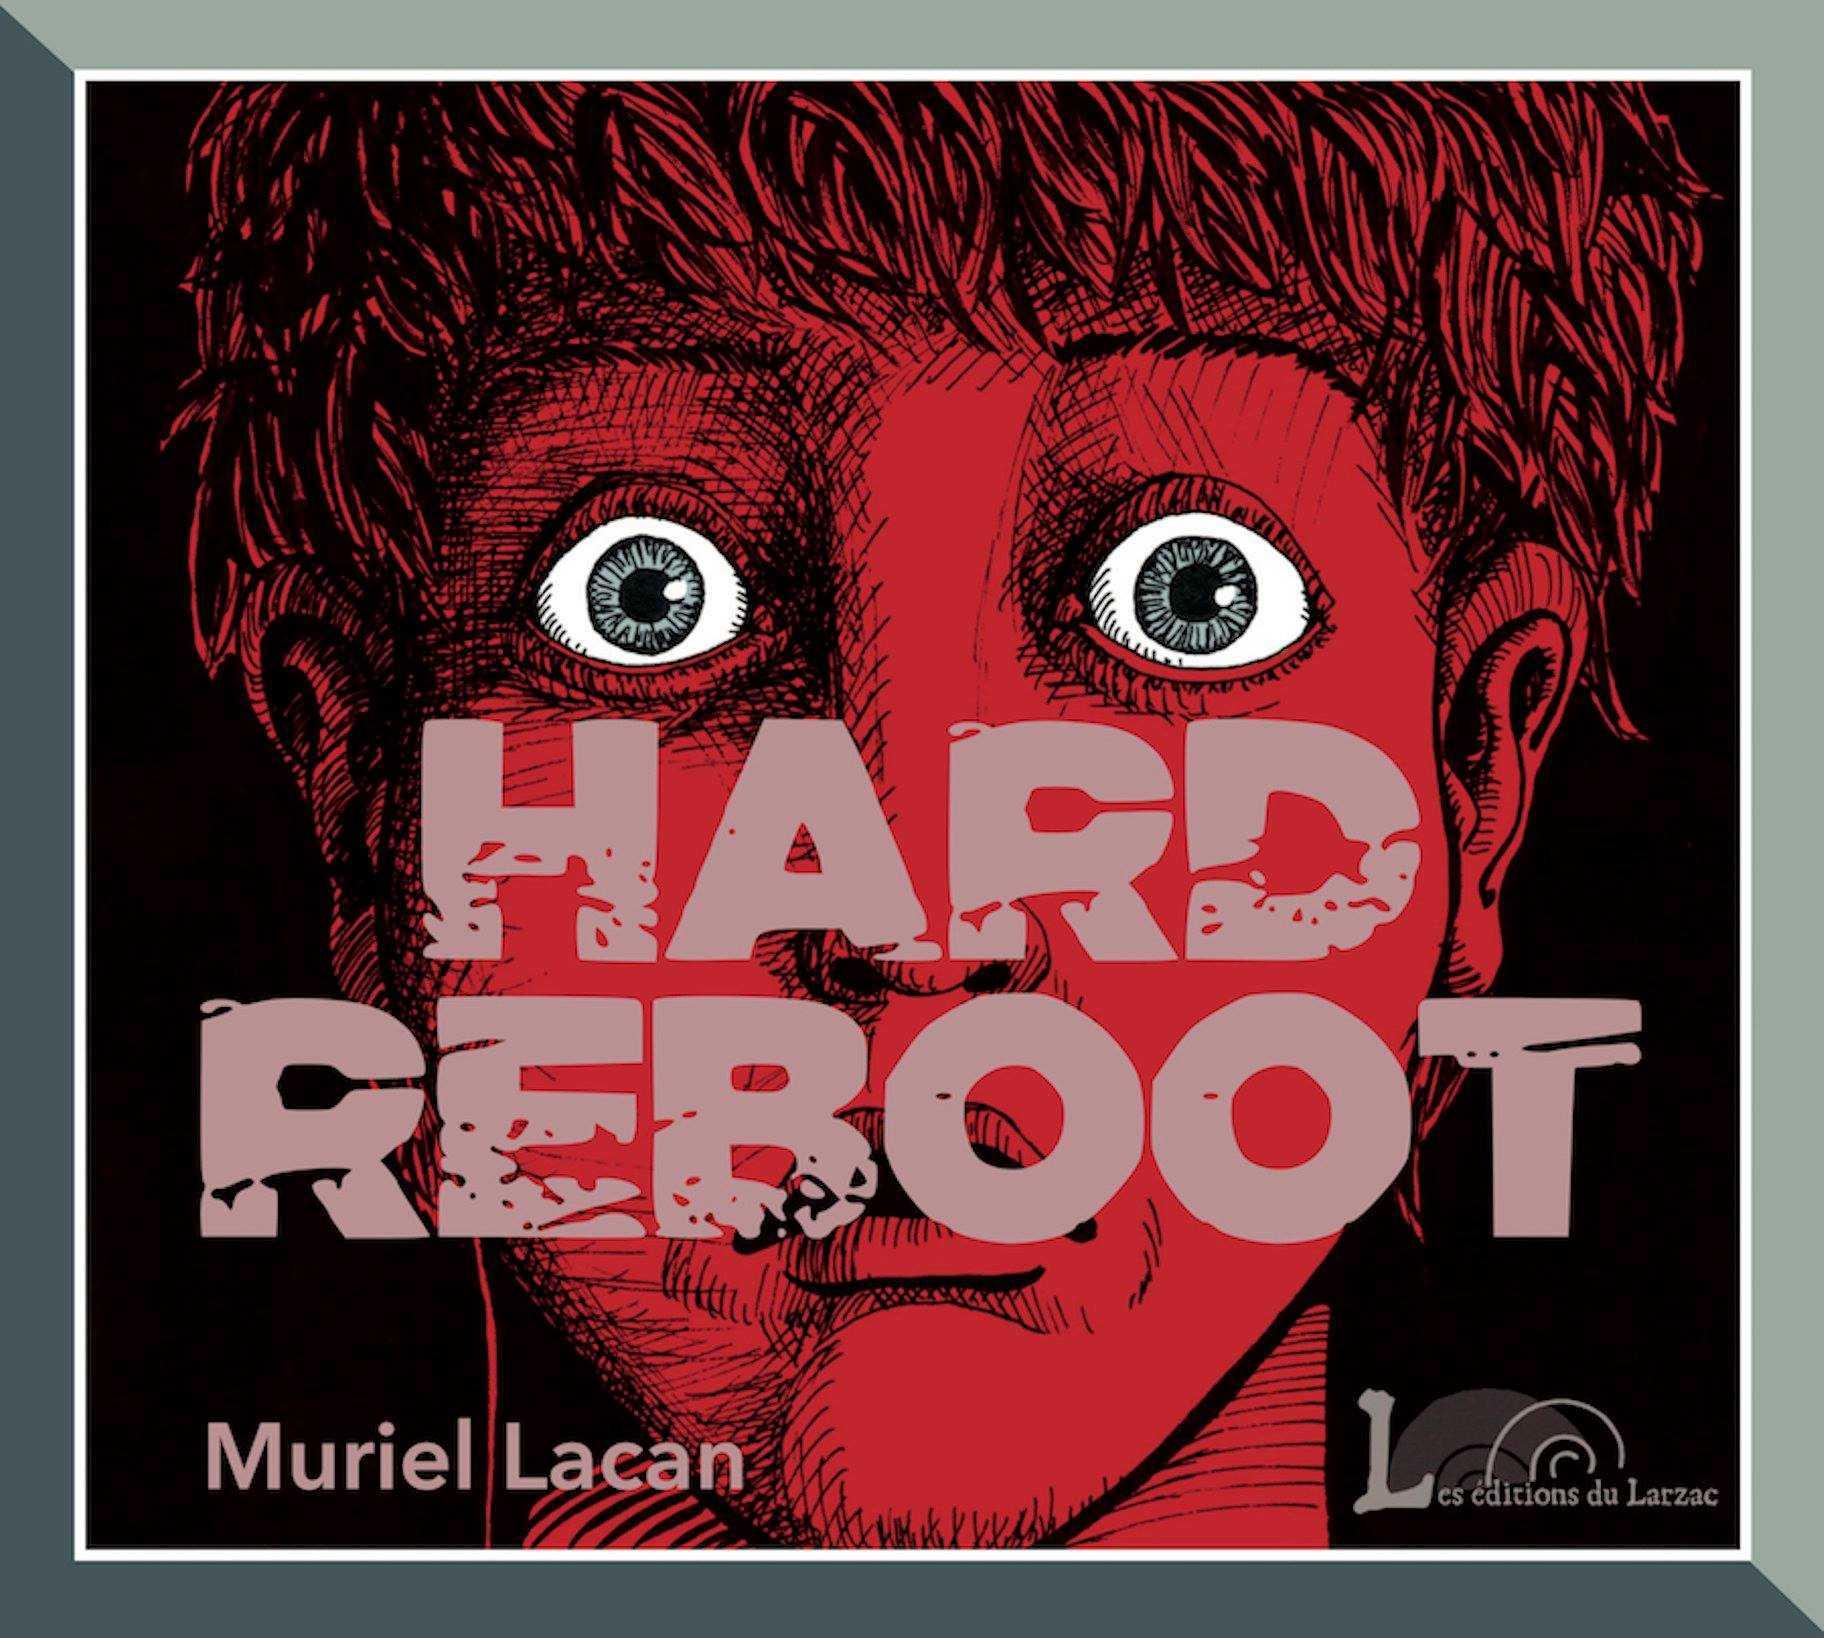 Hard Reboot, le monde est mal barré